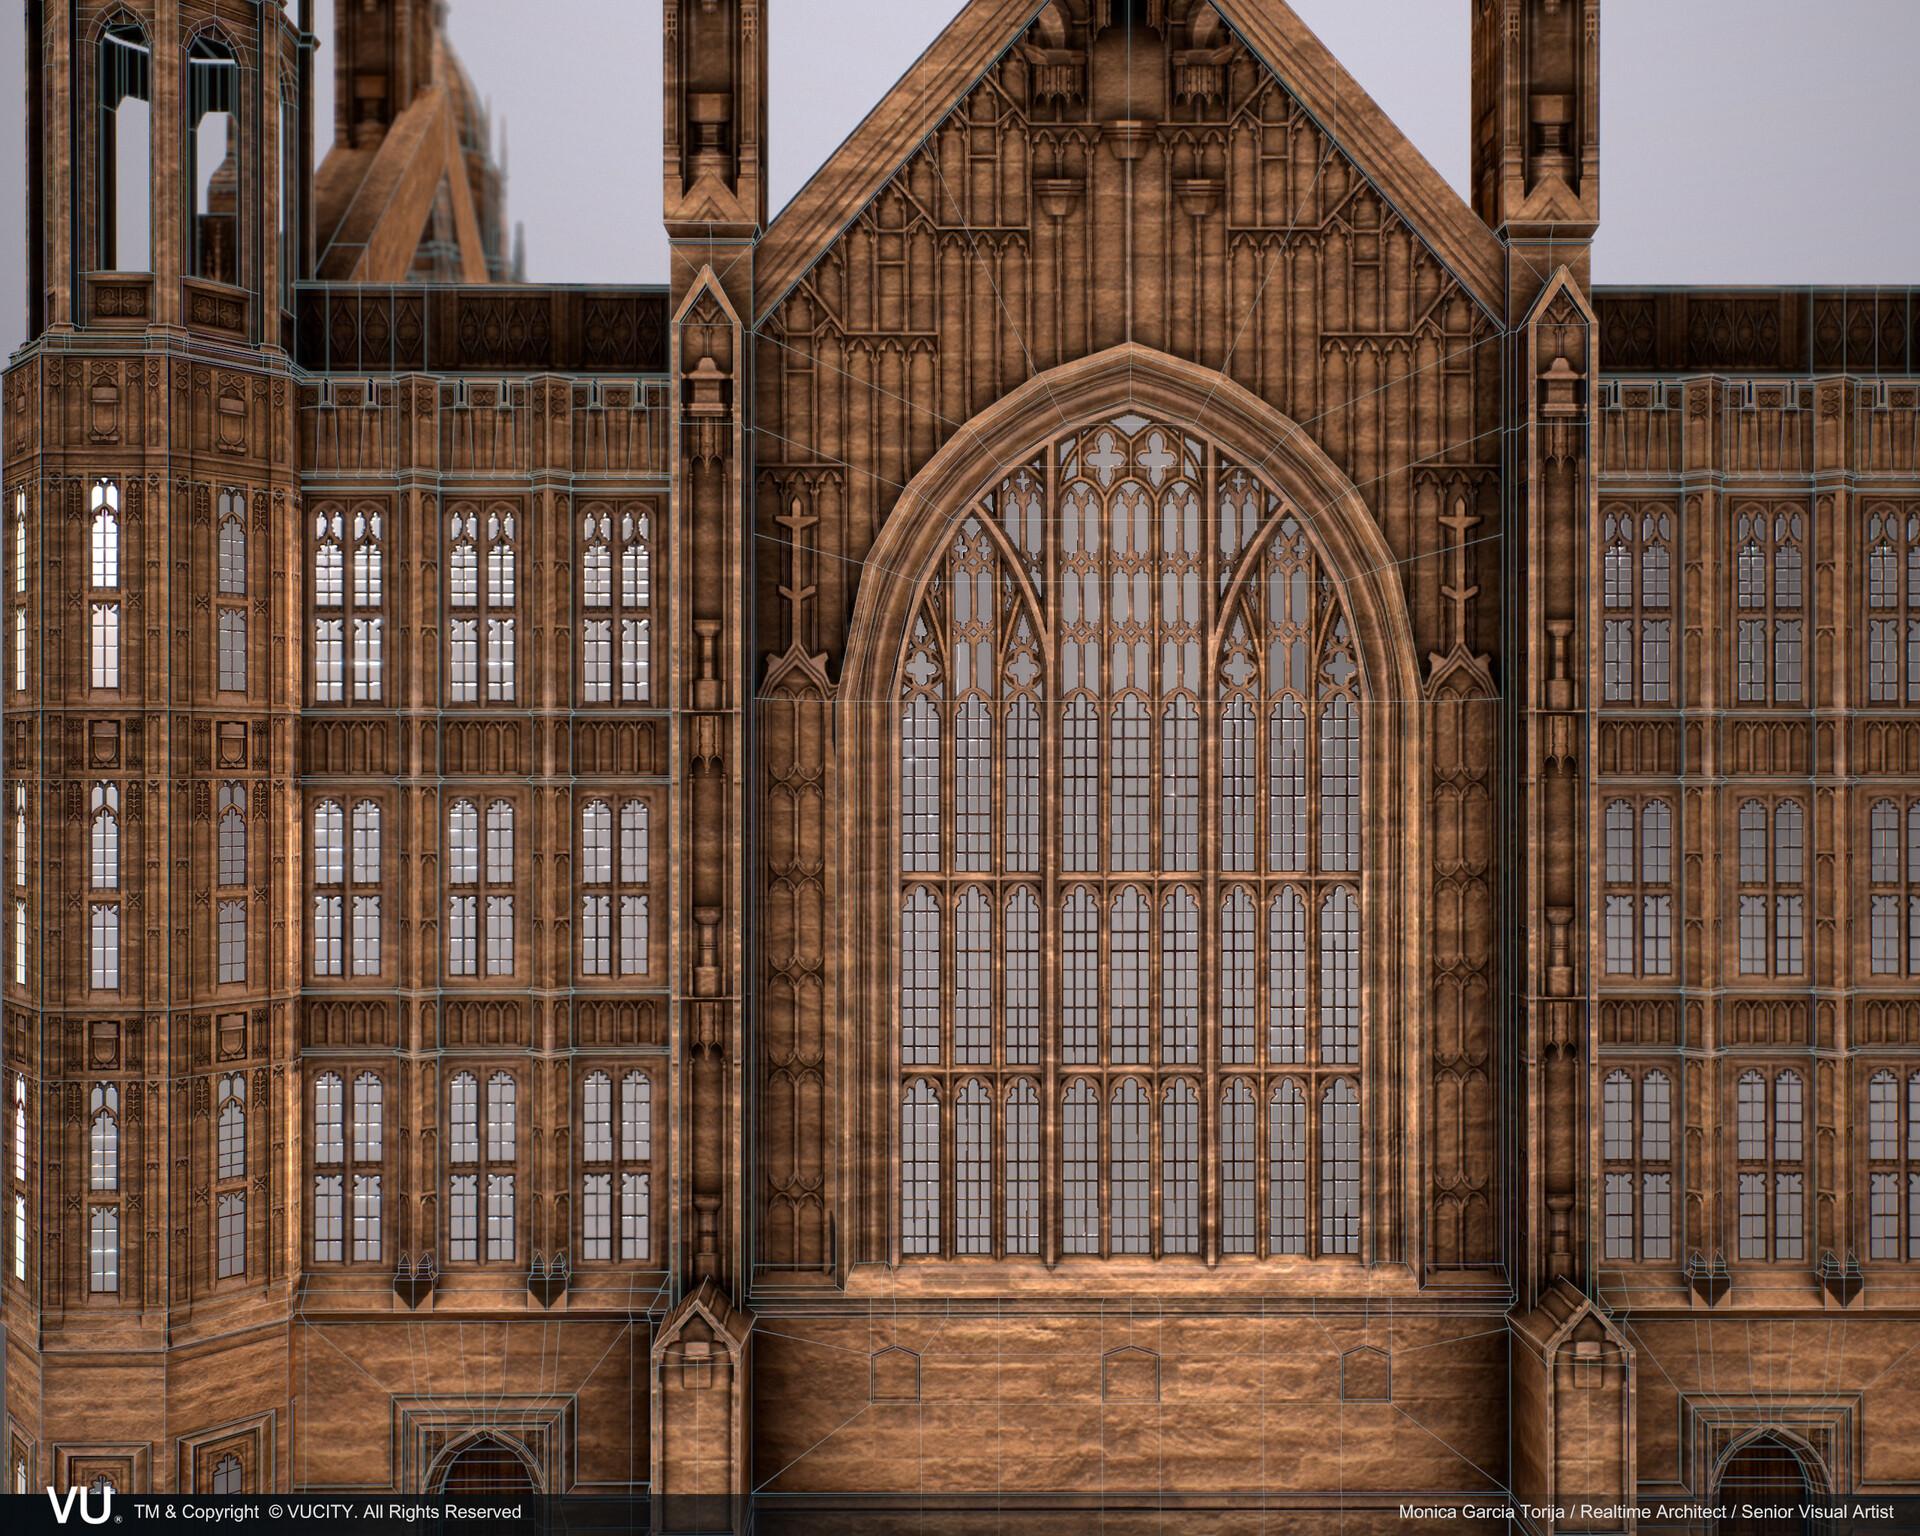 Monica garcia westminster parlamententrance 04